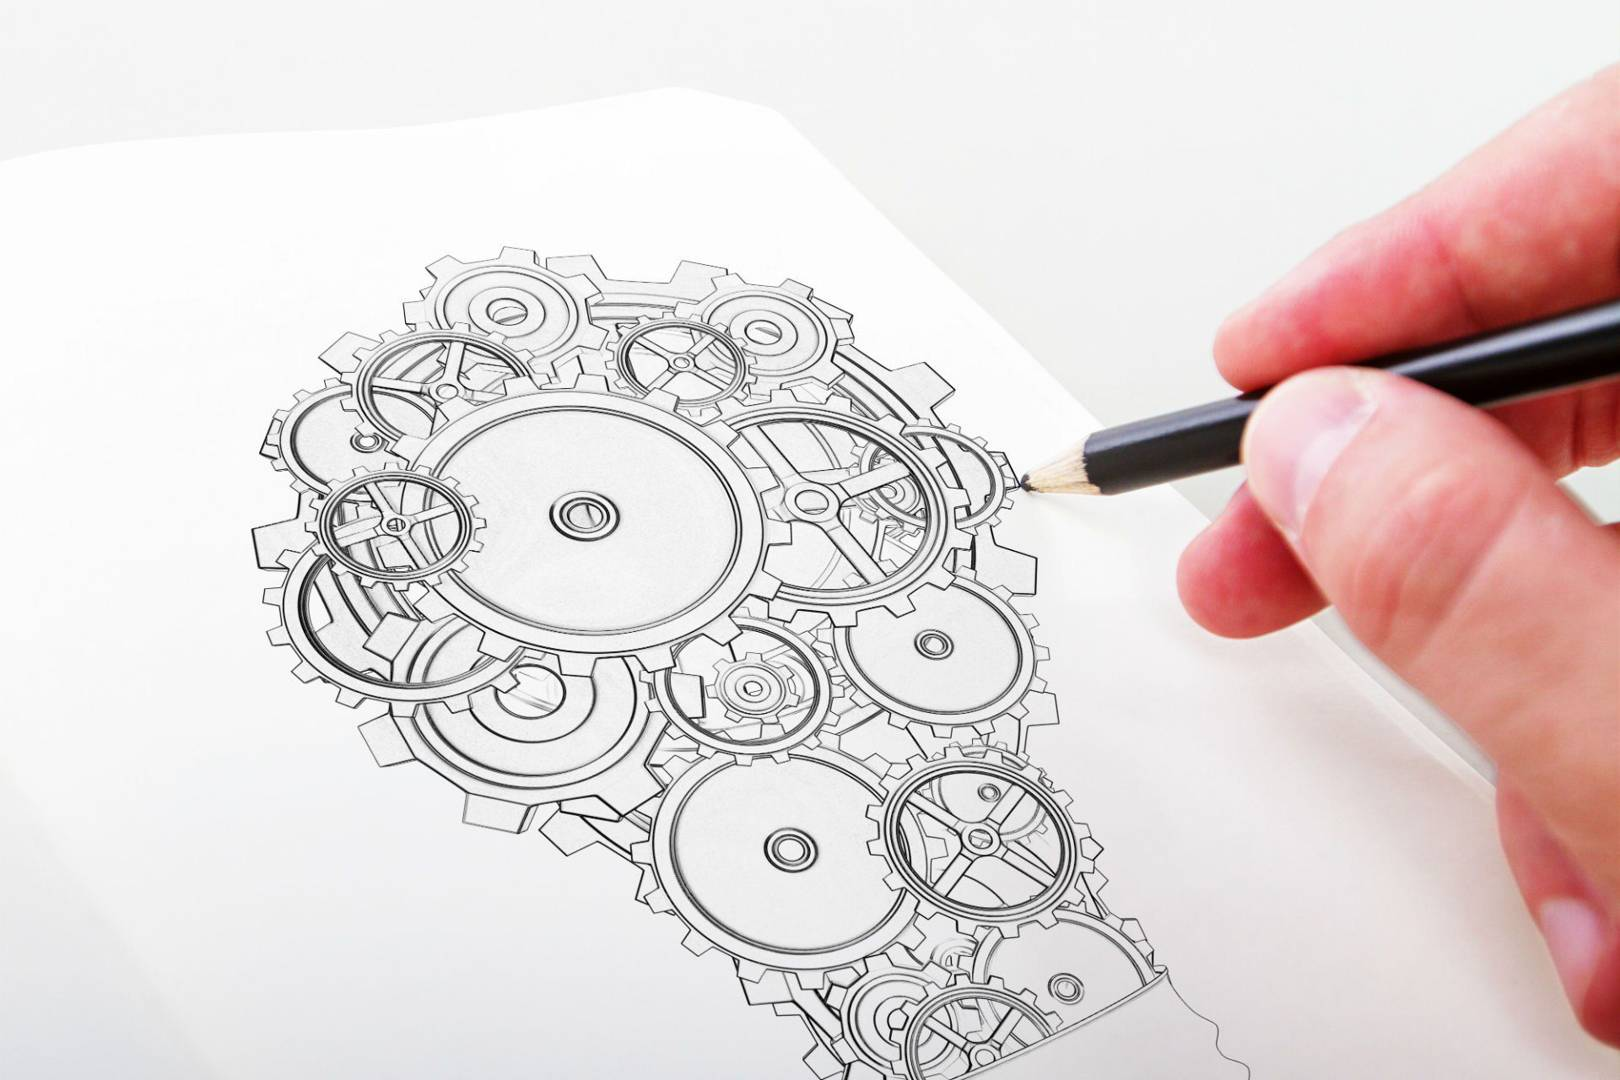 1620x1080 Digital Pen Is Better Dementia Prediction Tool Than A Doctor